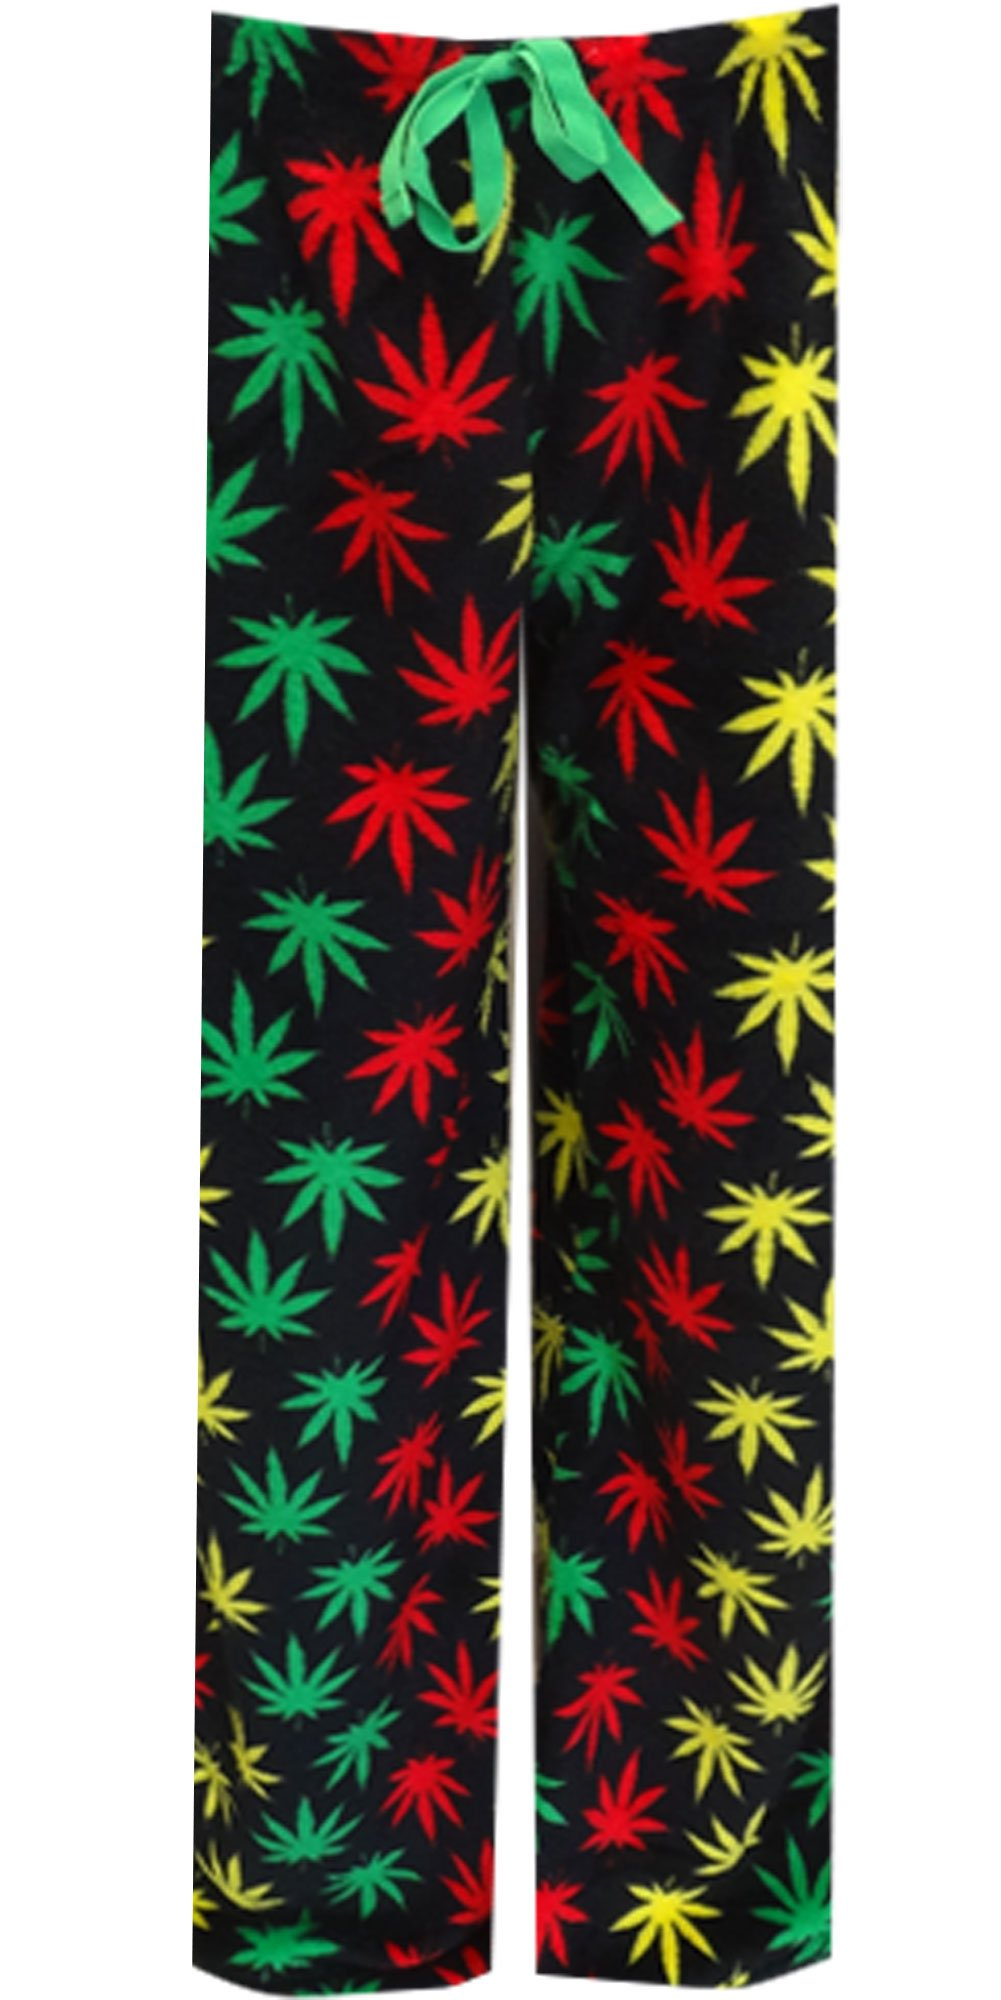 Rasta Themed Ganja Leaf Cozy Plush Loungepants for men